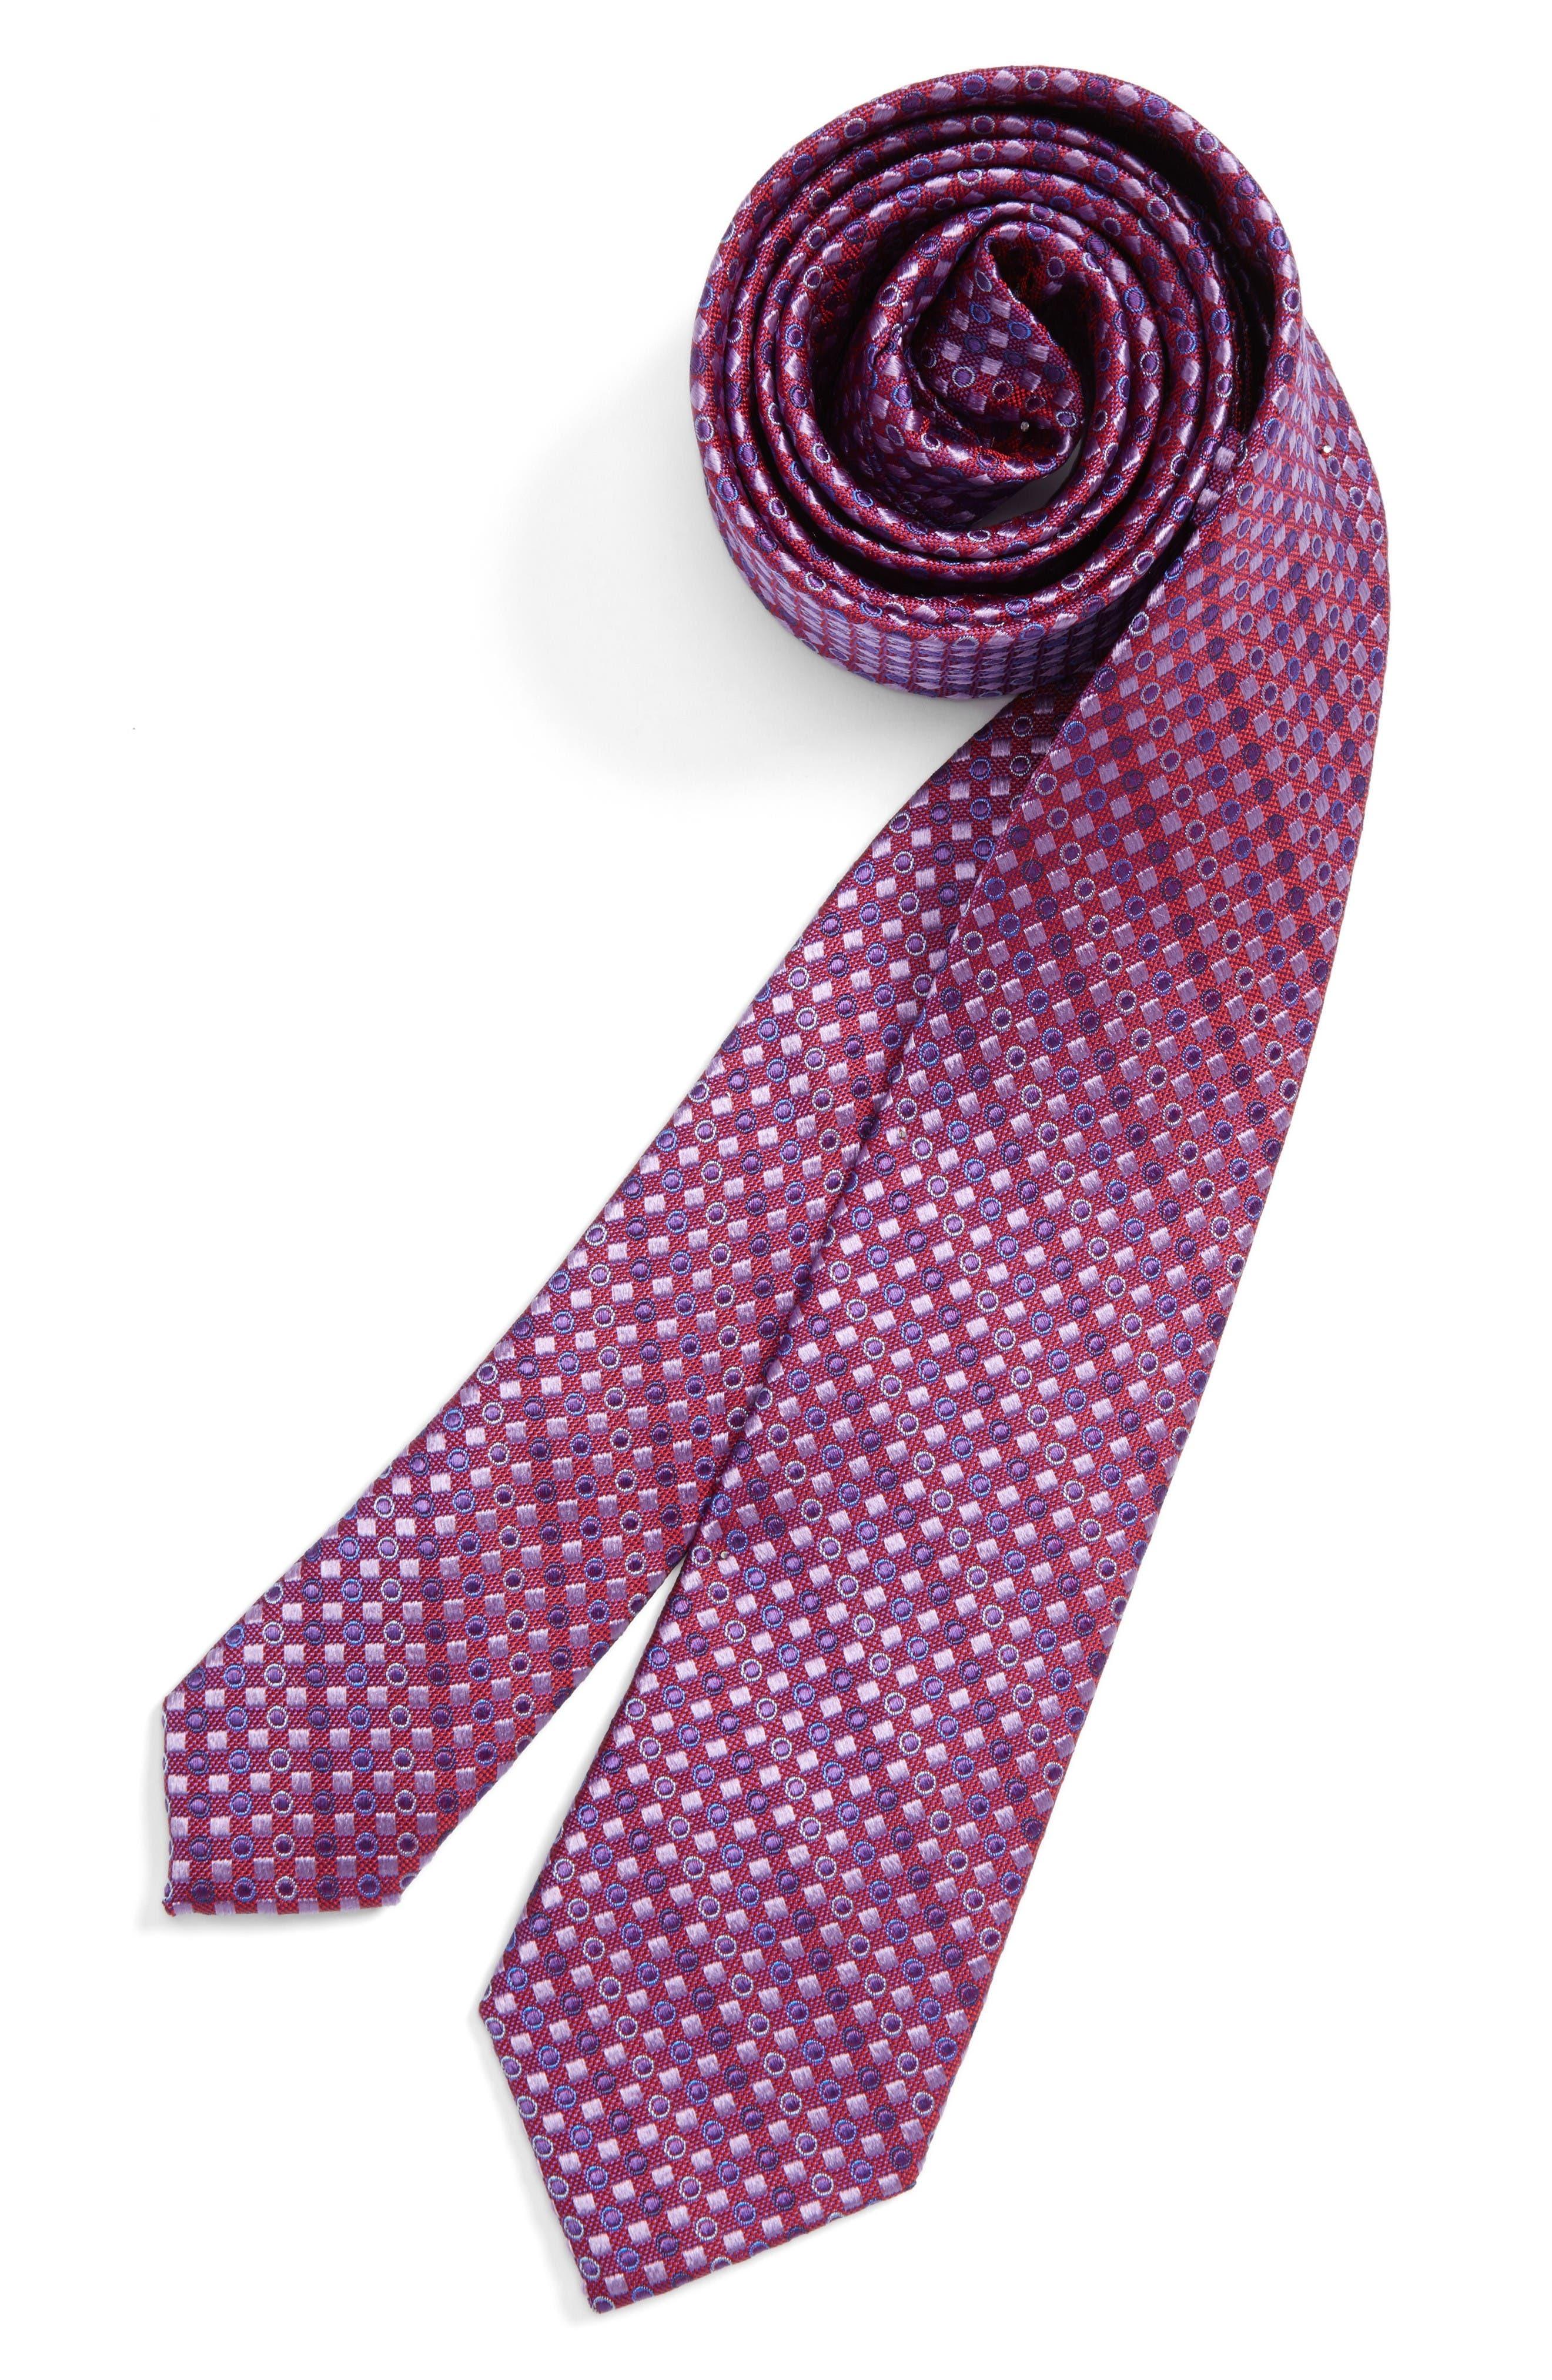 MICHAEL KORS Neat Silk Tie